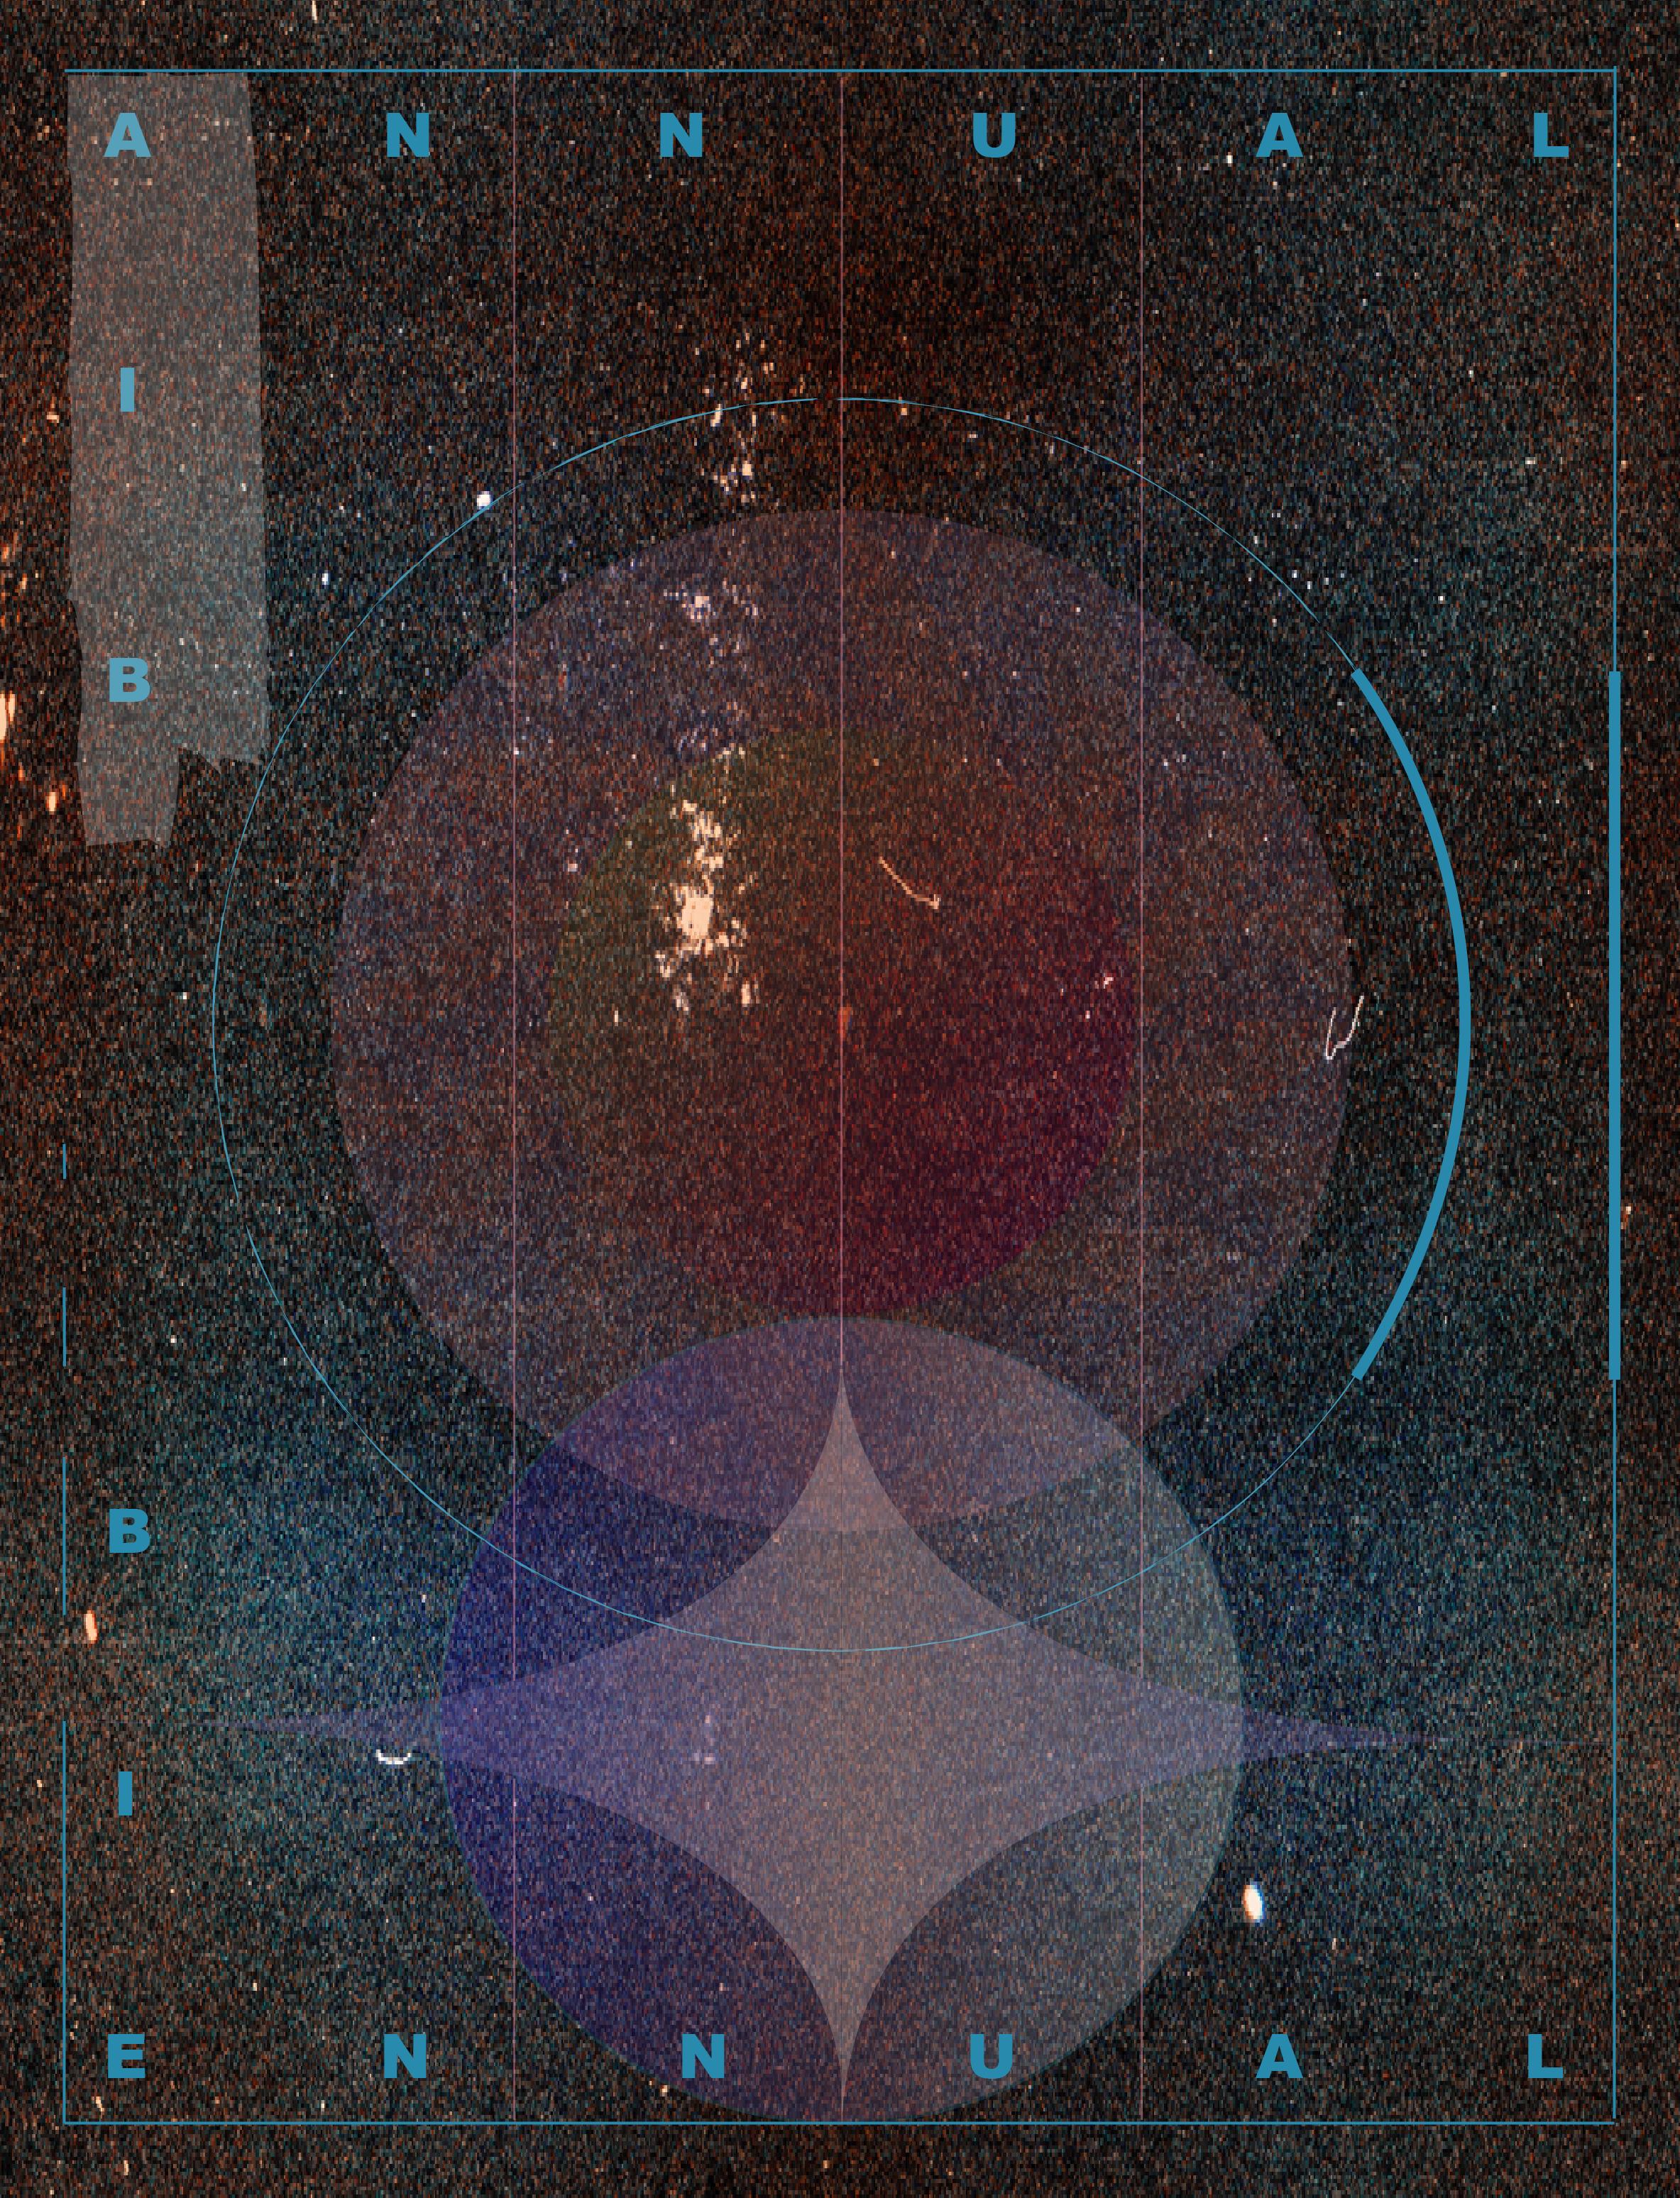 Biannual/Biennual Poster